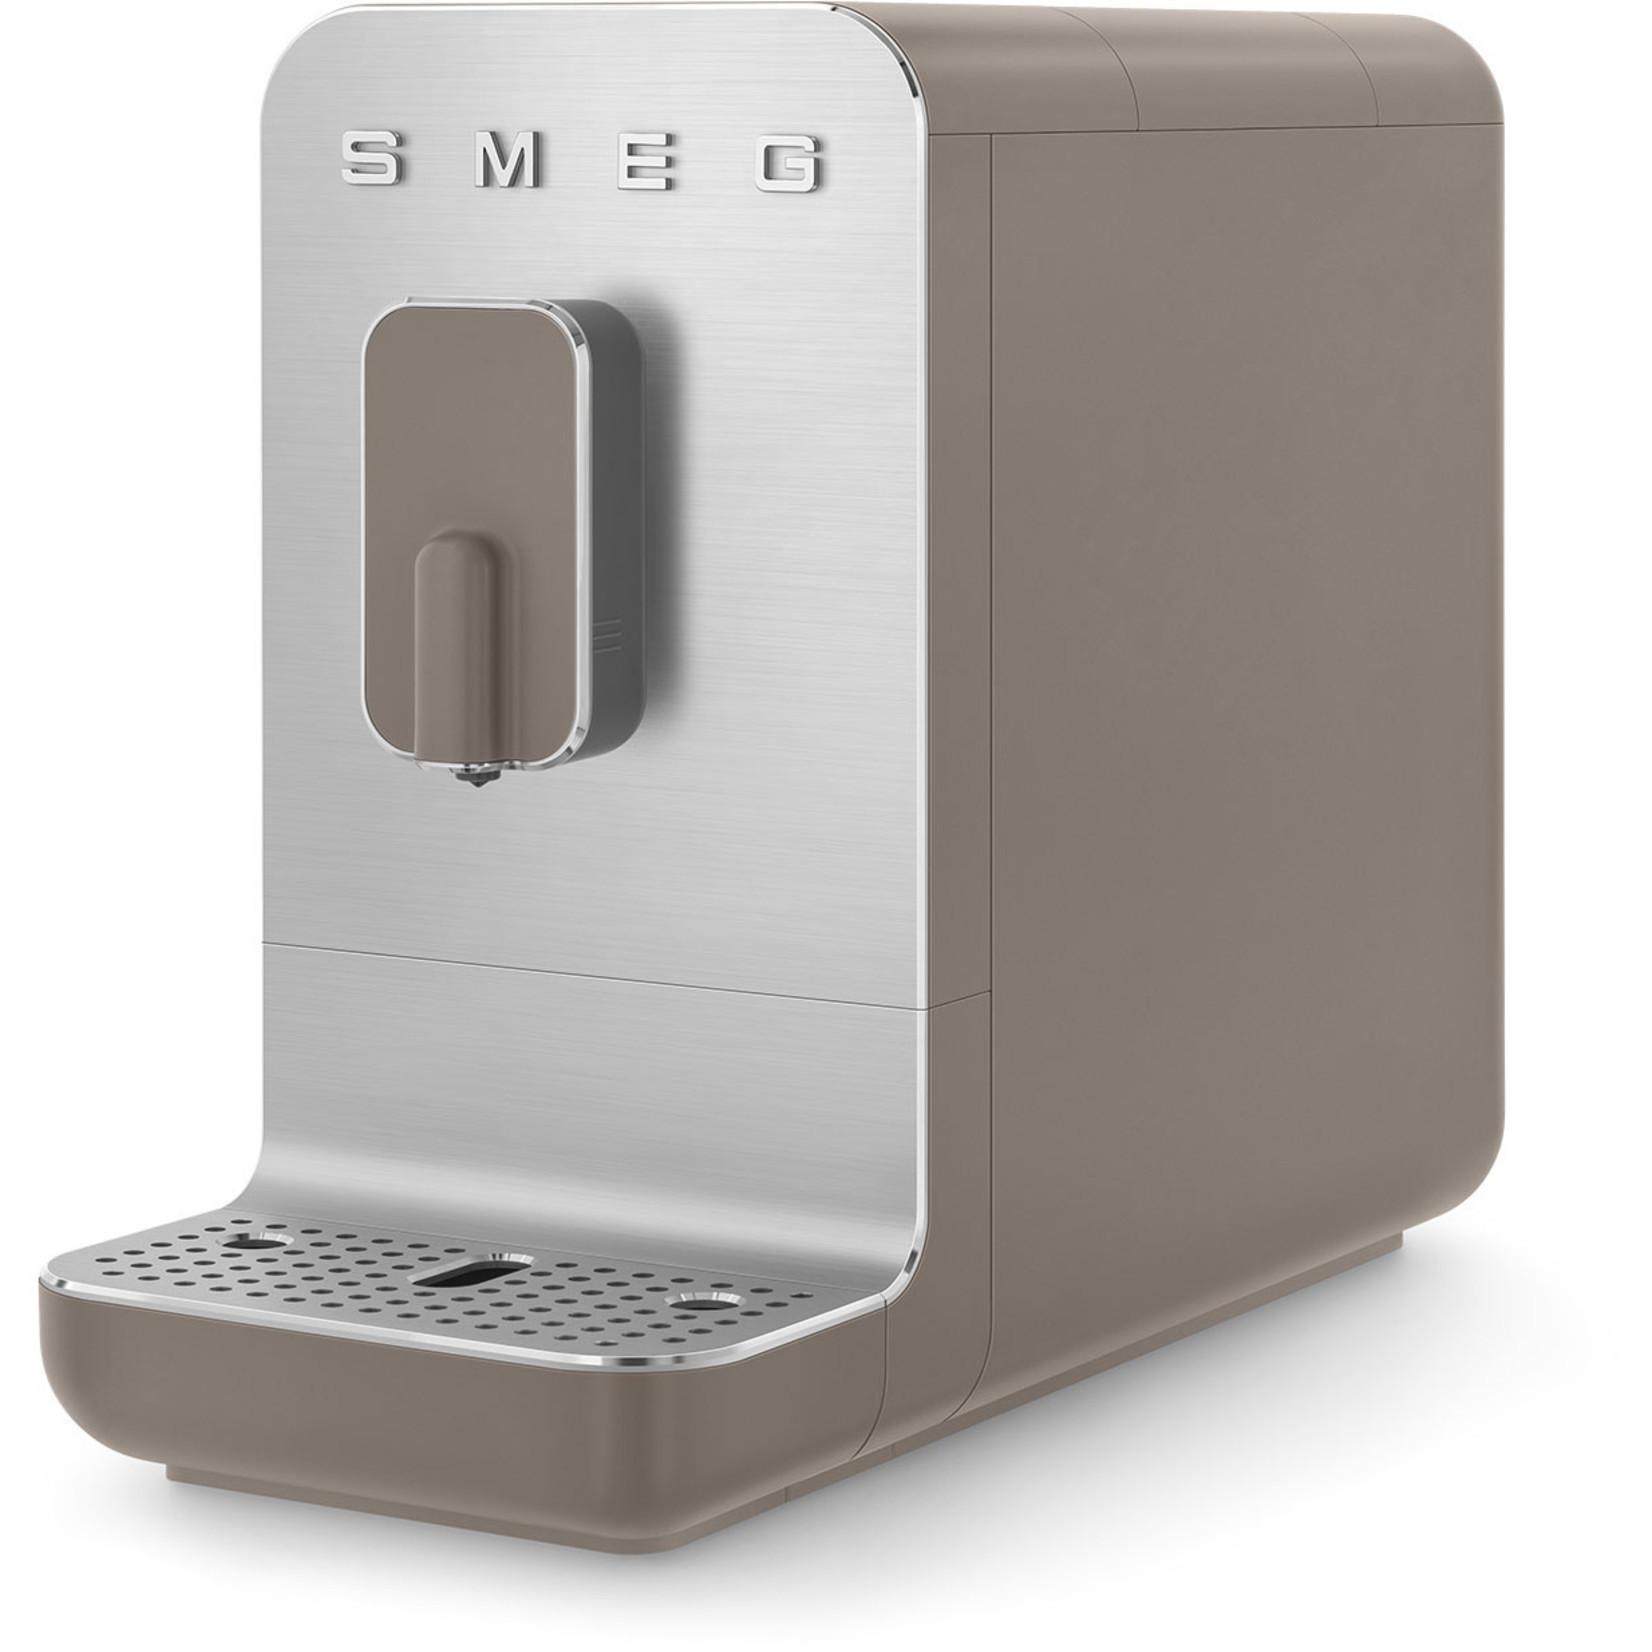 Smeg Smeg espressomachine basic, mat taupe